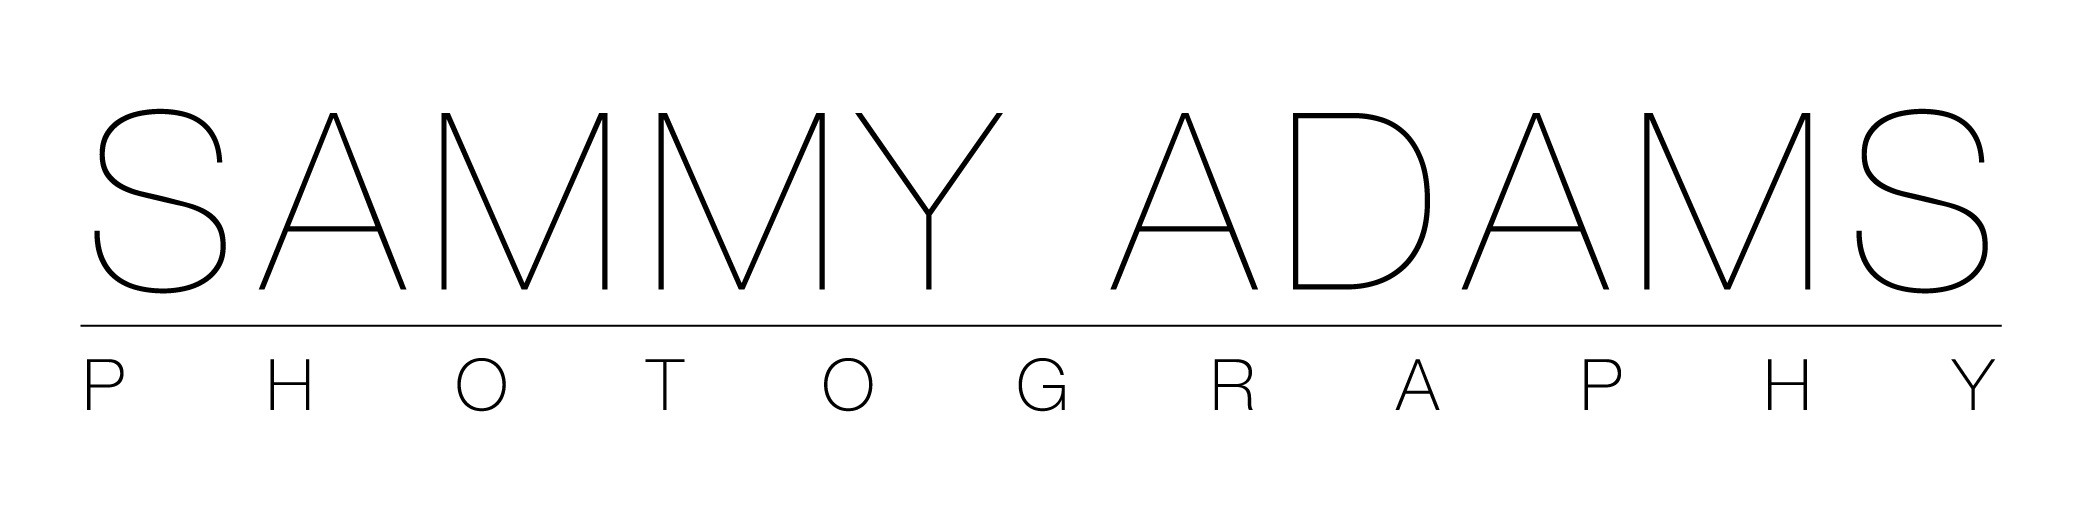 Sammy Adams Photography Logo-01.png